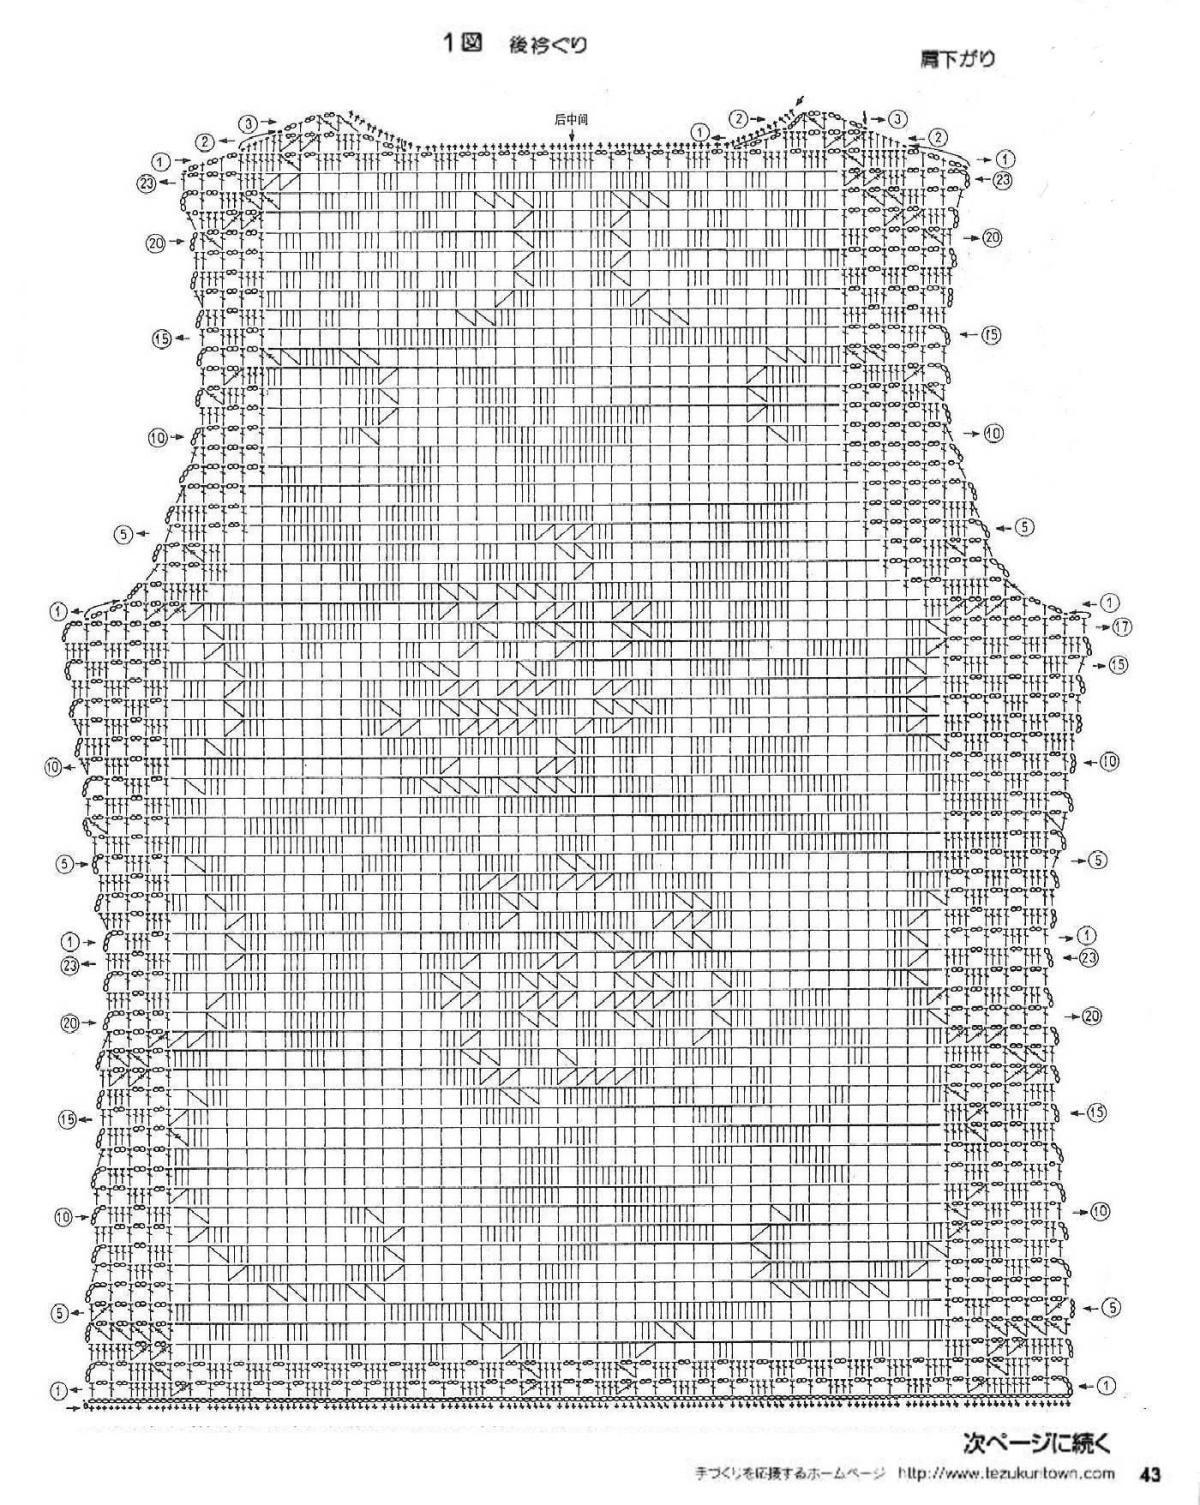 5d3b50bfc52e4251d000b9b0eab0575c_3 | blusas a crochet | Pinterest ...